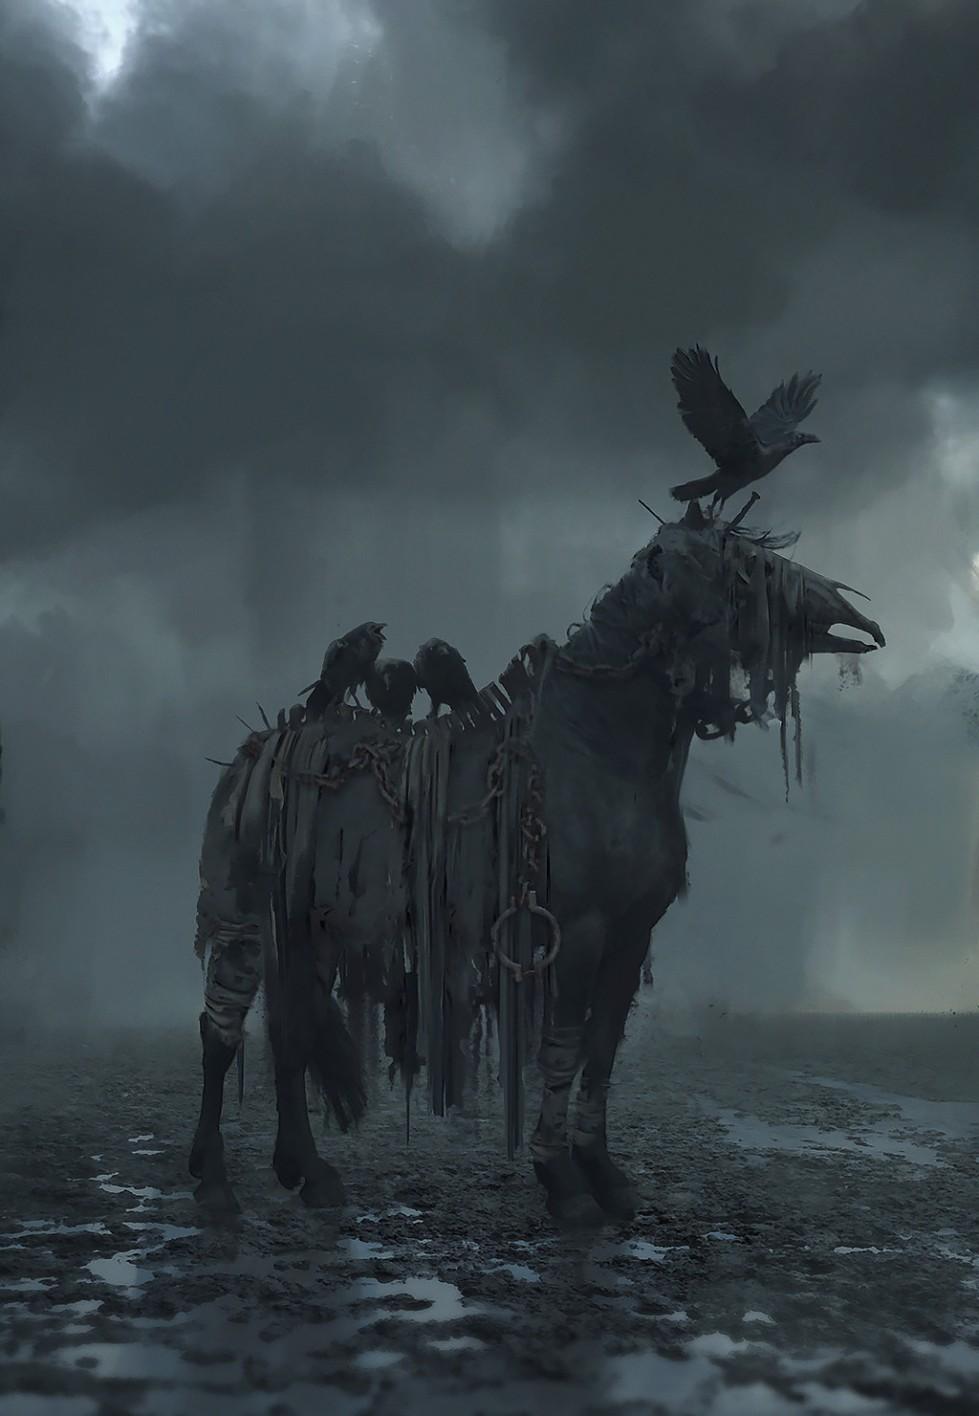 rostyslav-zagornov-deadhorse1